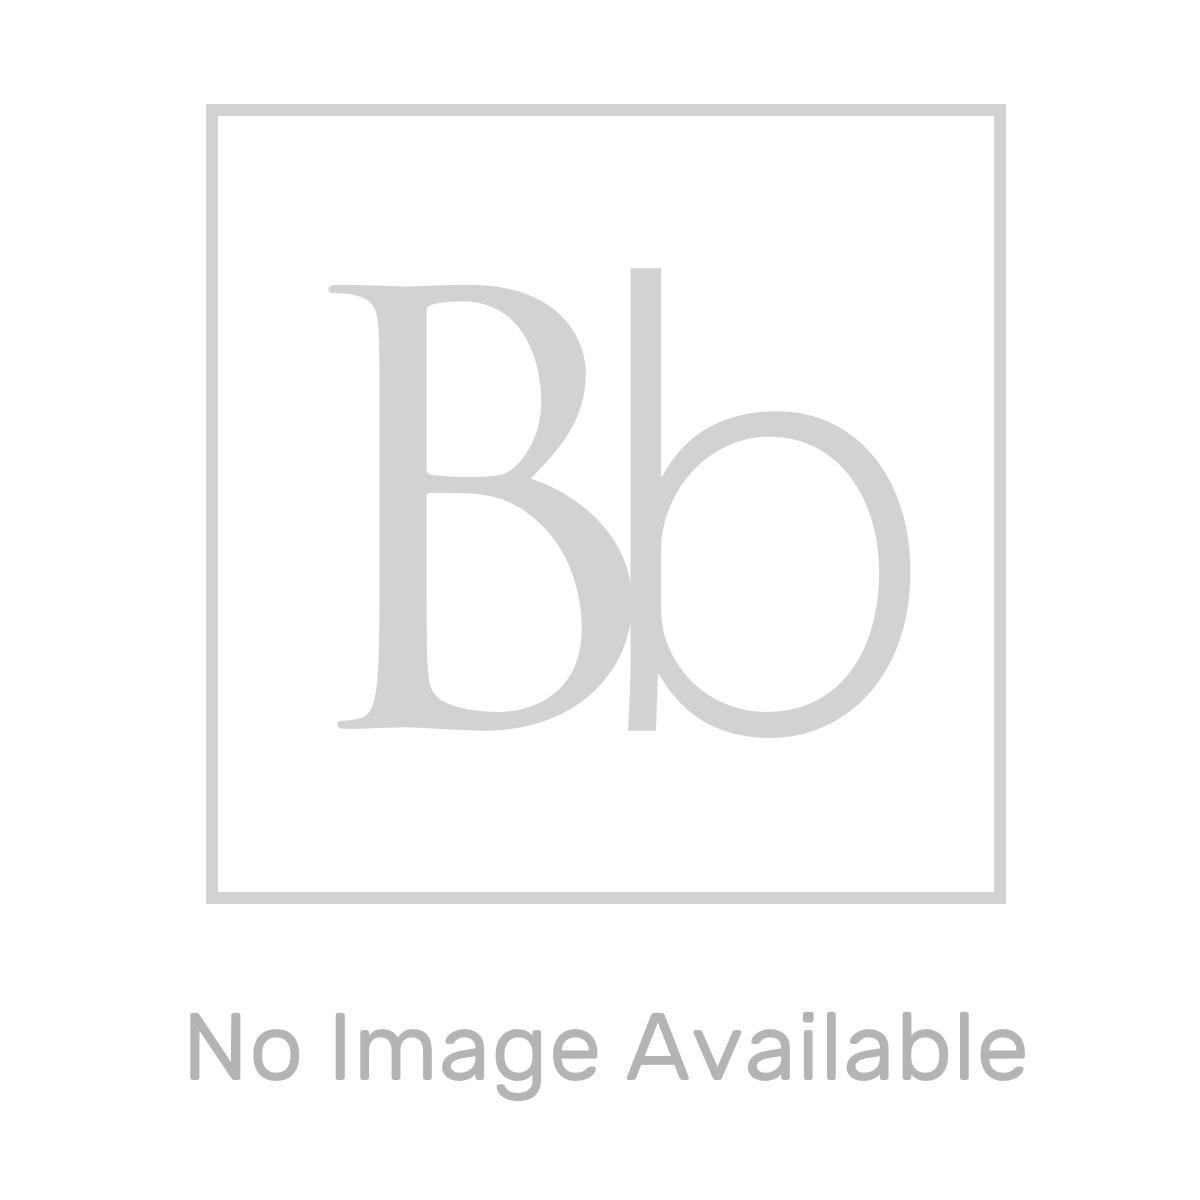 Premier Linton Single Ended Bath 1600 x 700mm Dimensions